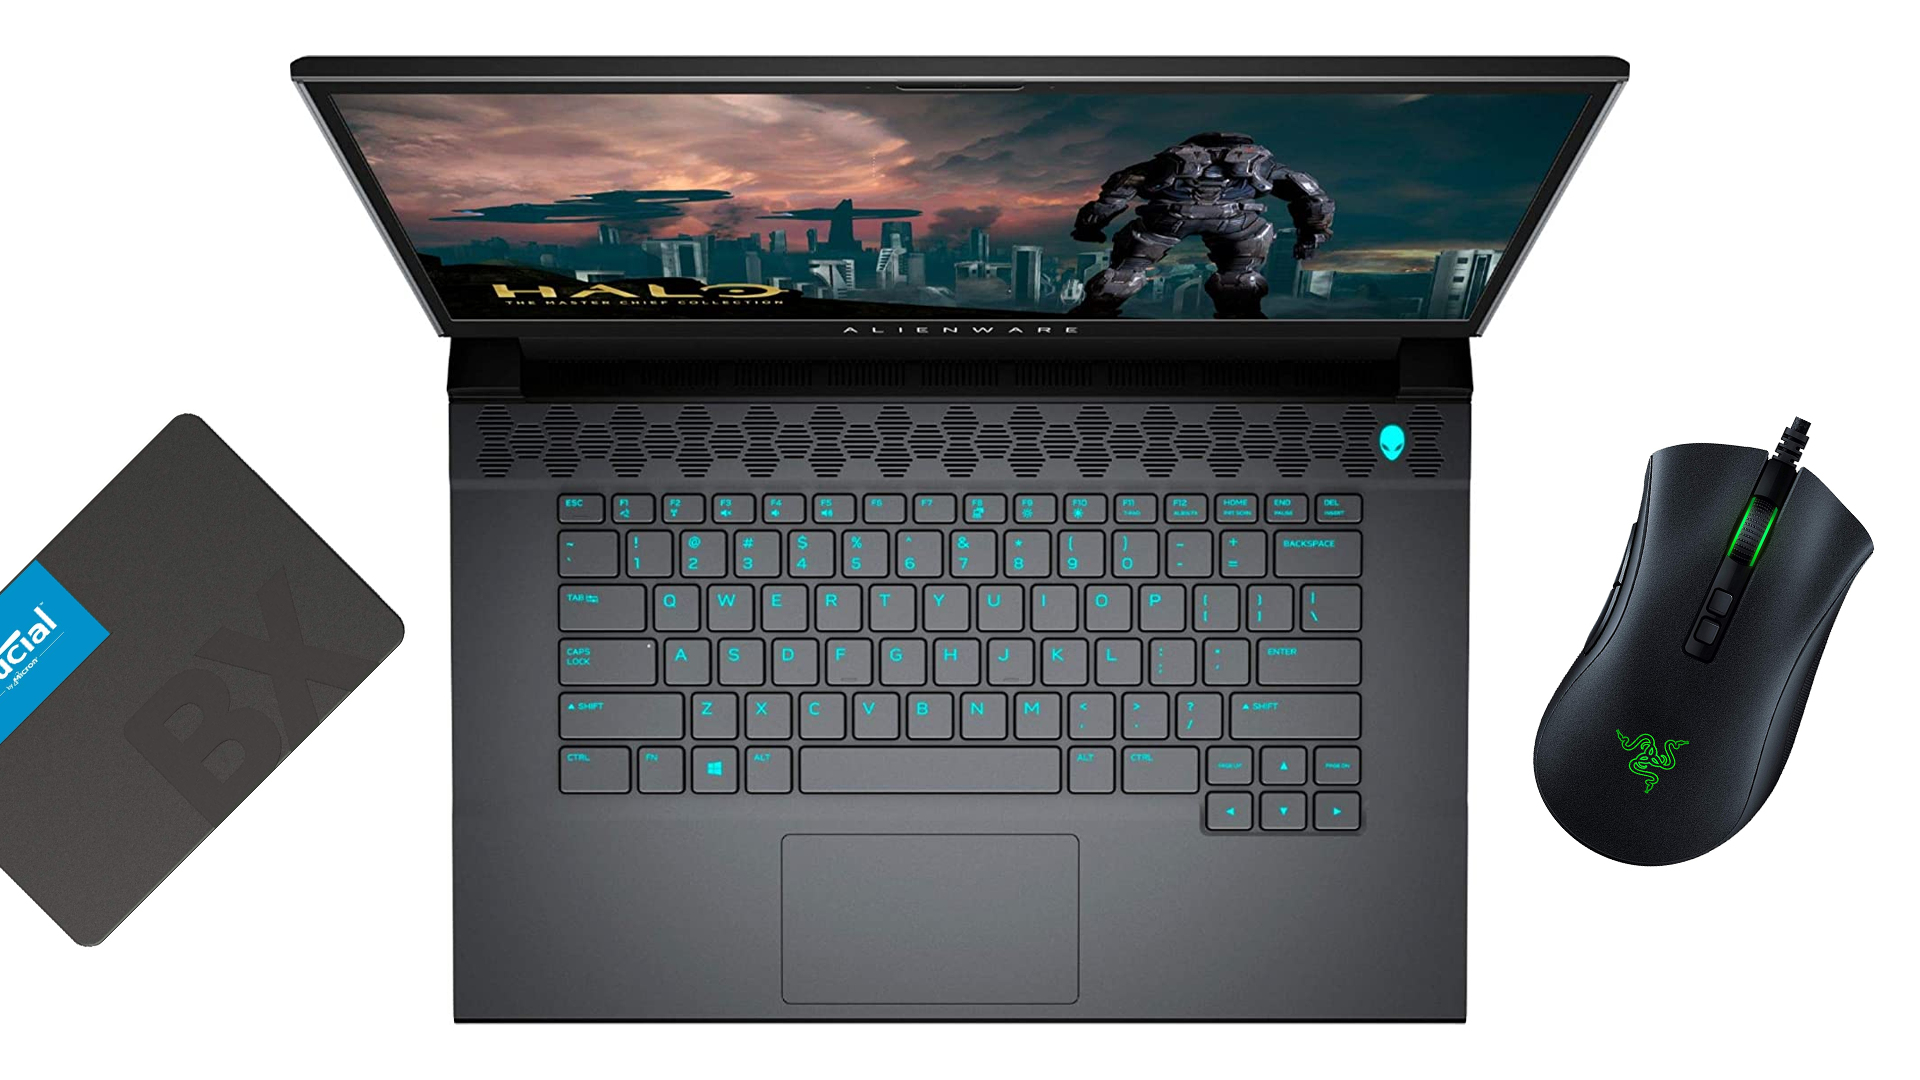 كمبيوتر محمول من Alienware و Crucial SSD و Razer Deathadder mouse.